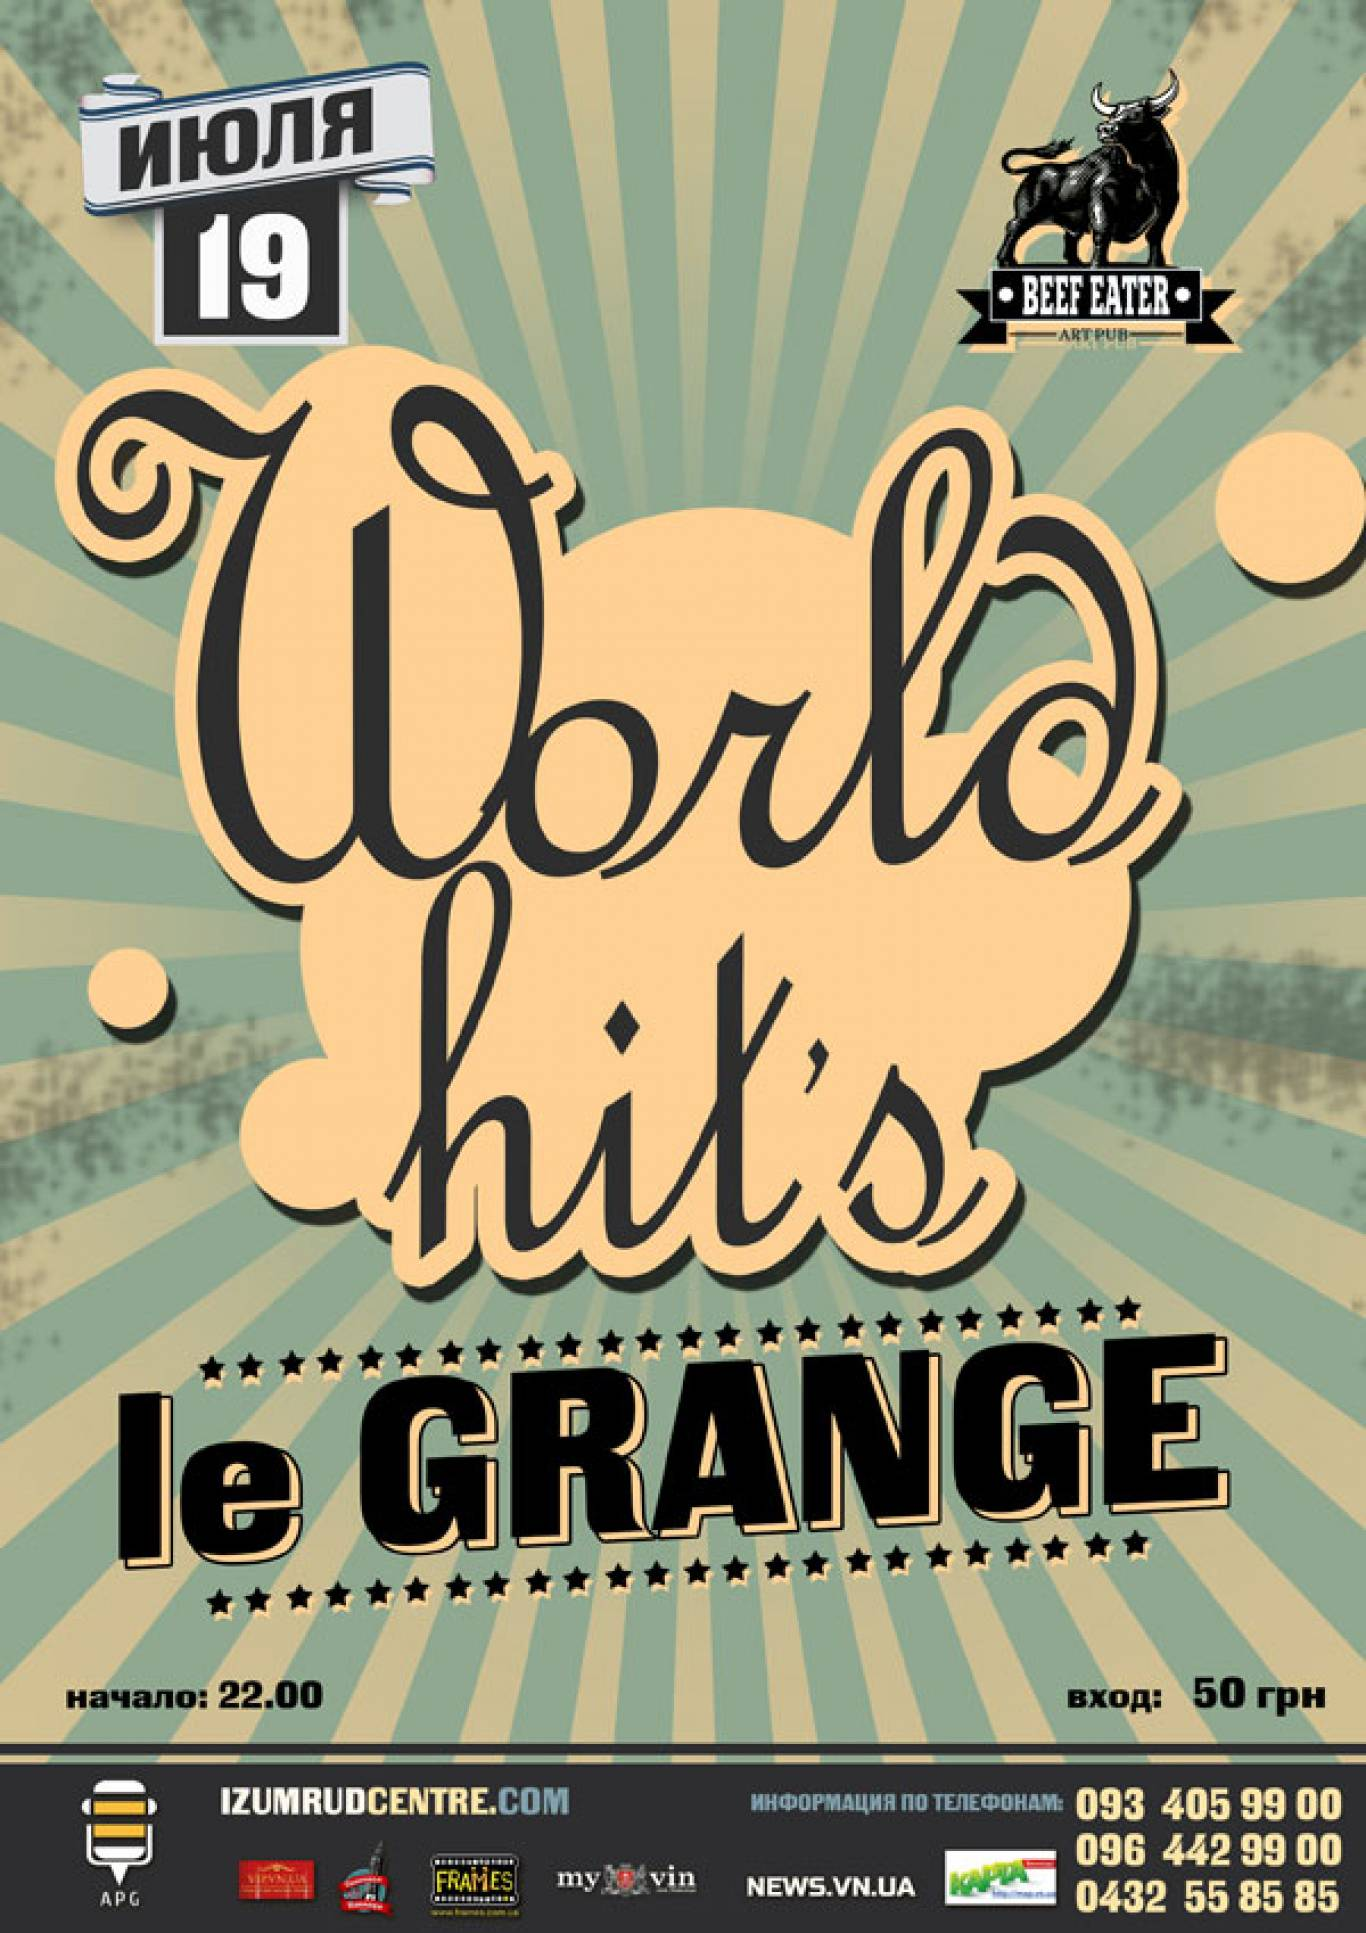 Група Le Grange. World hits.